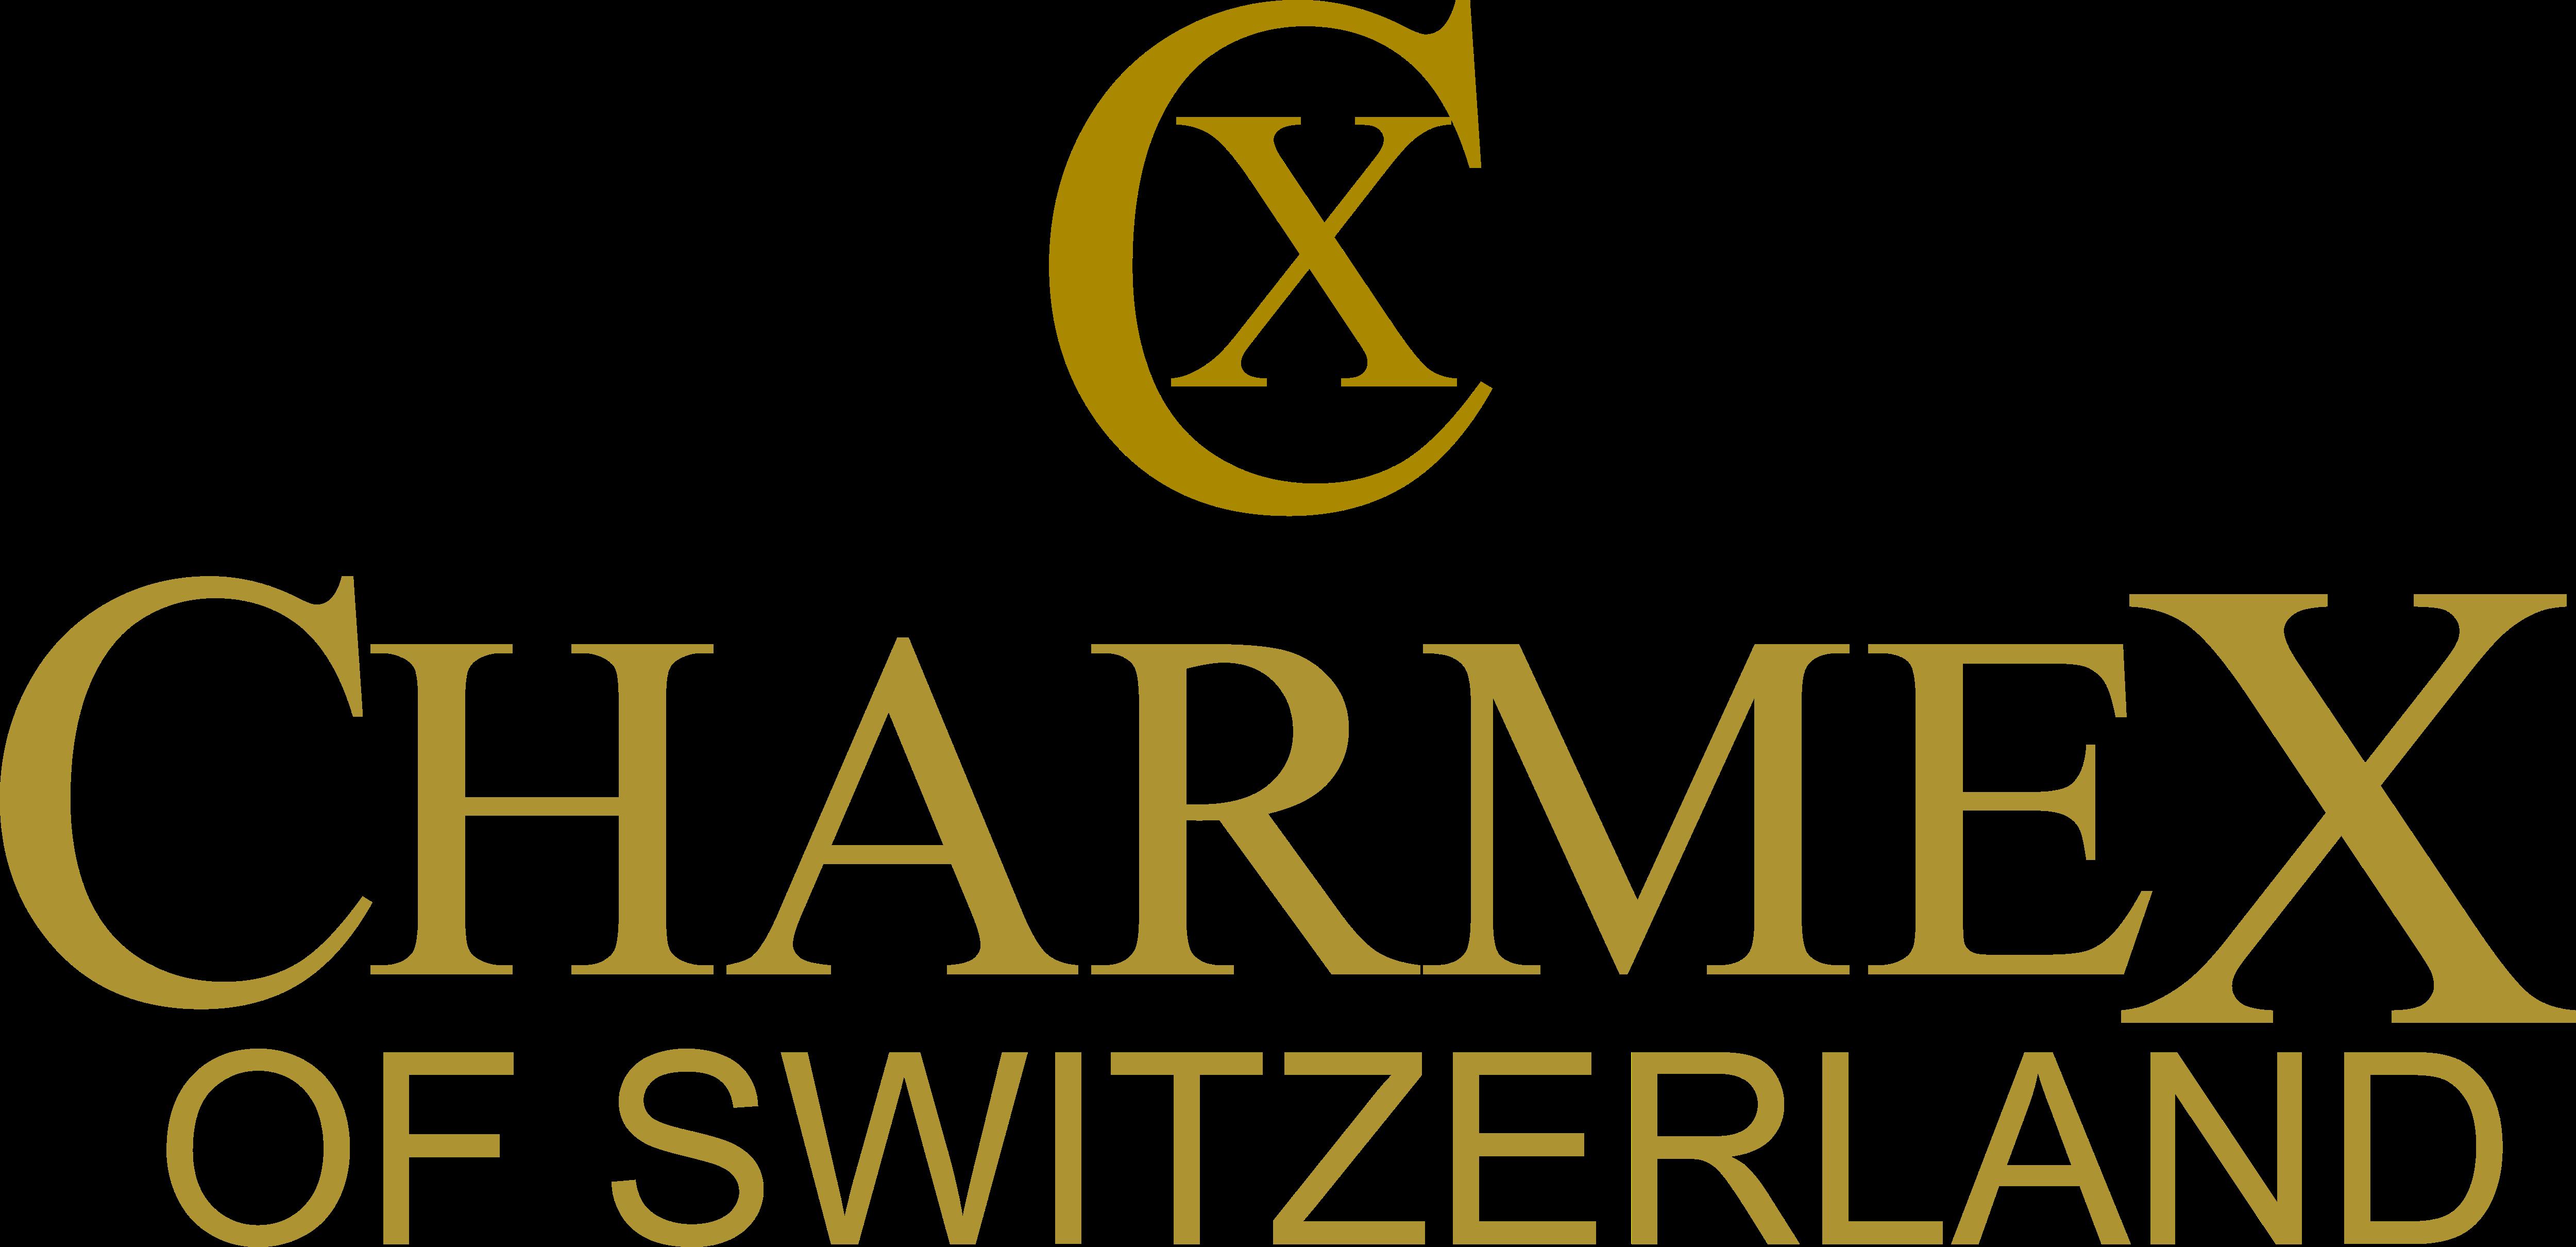 Charmex - Logos Download